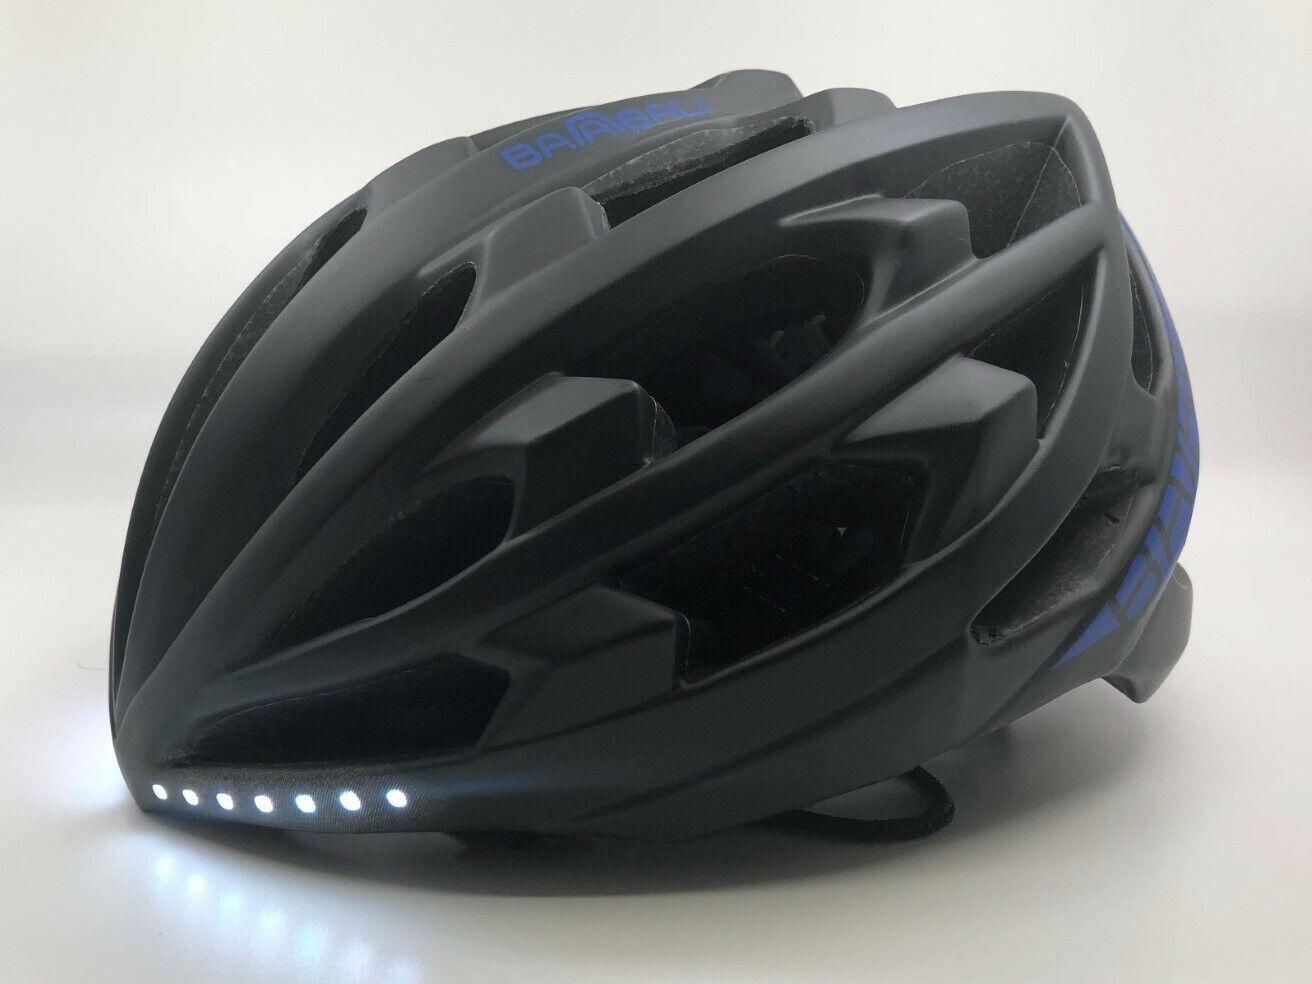 Baabali SMART bike casco con illuminazione a LED